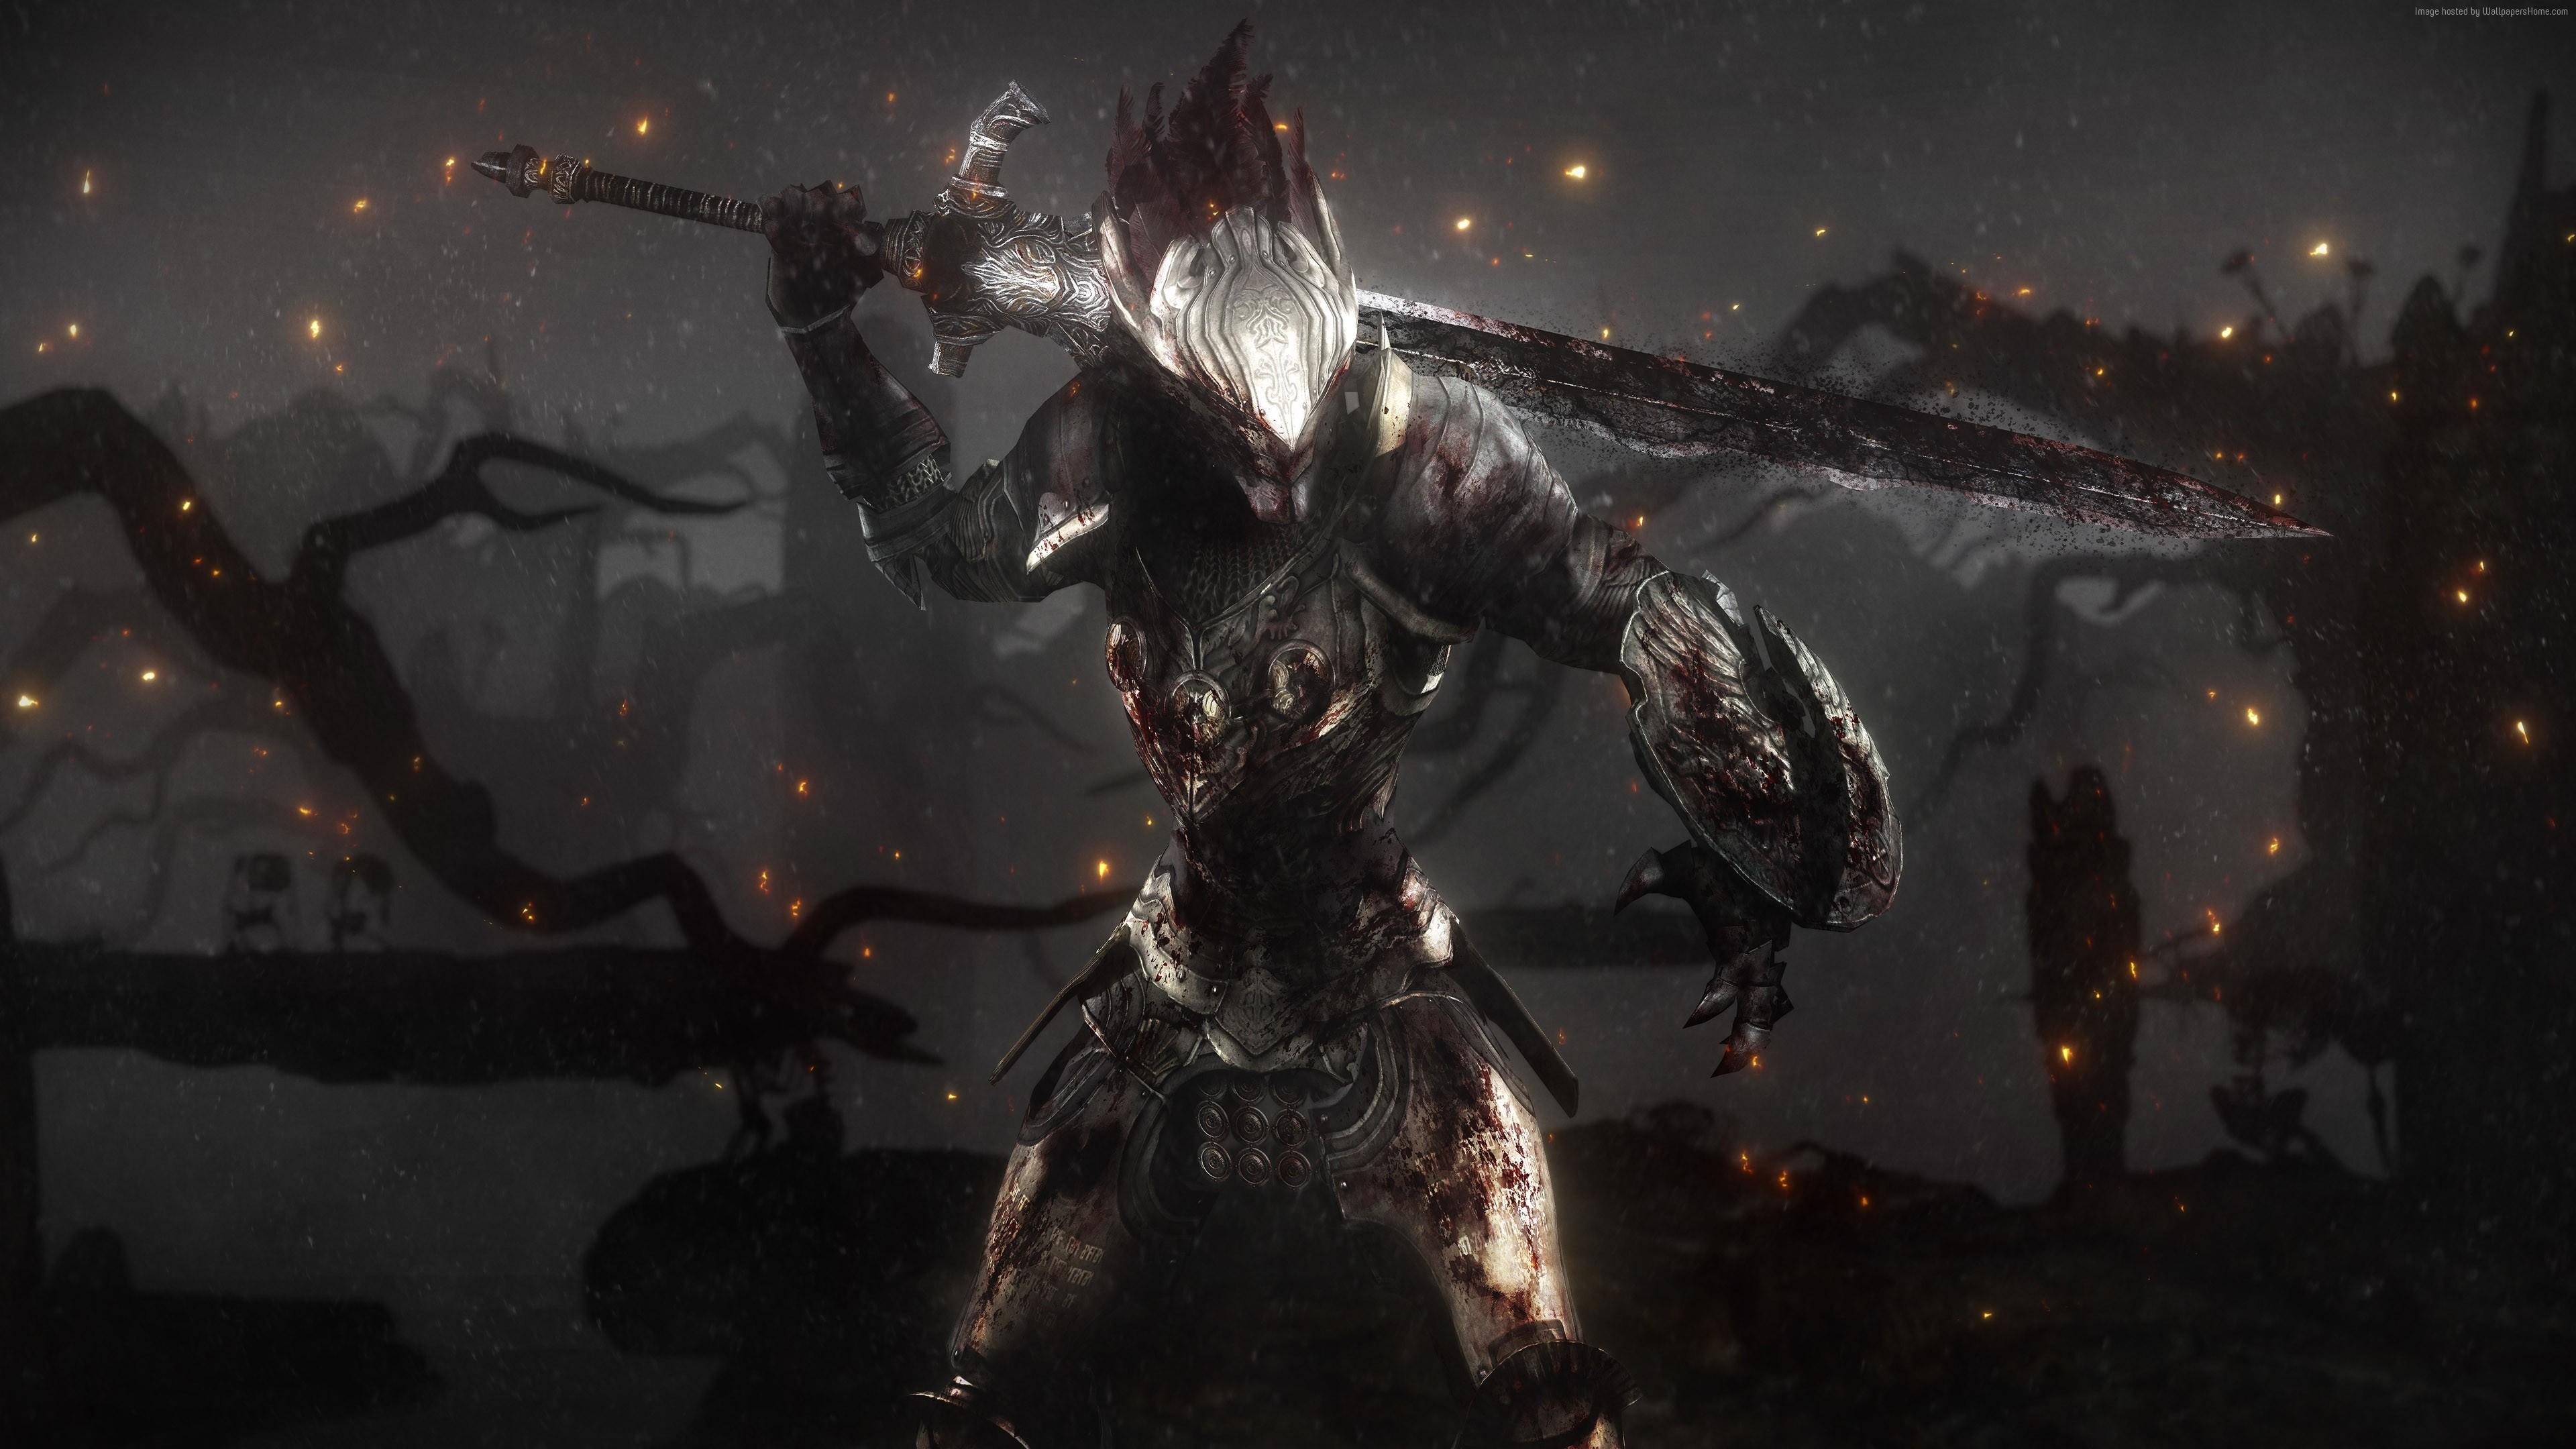 September 29, 2015 By Stephen Comments Off on Dark Souls 3 Wallpaper .